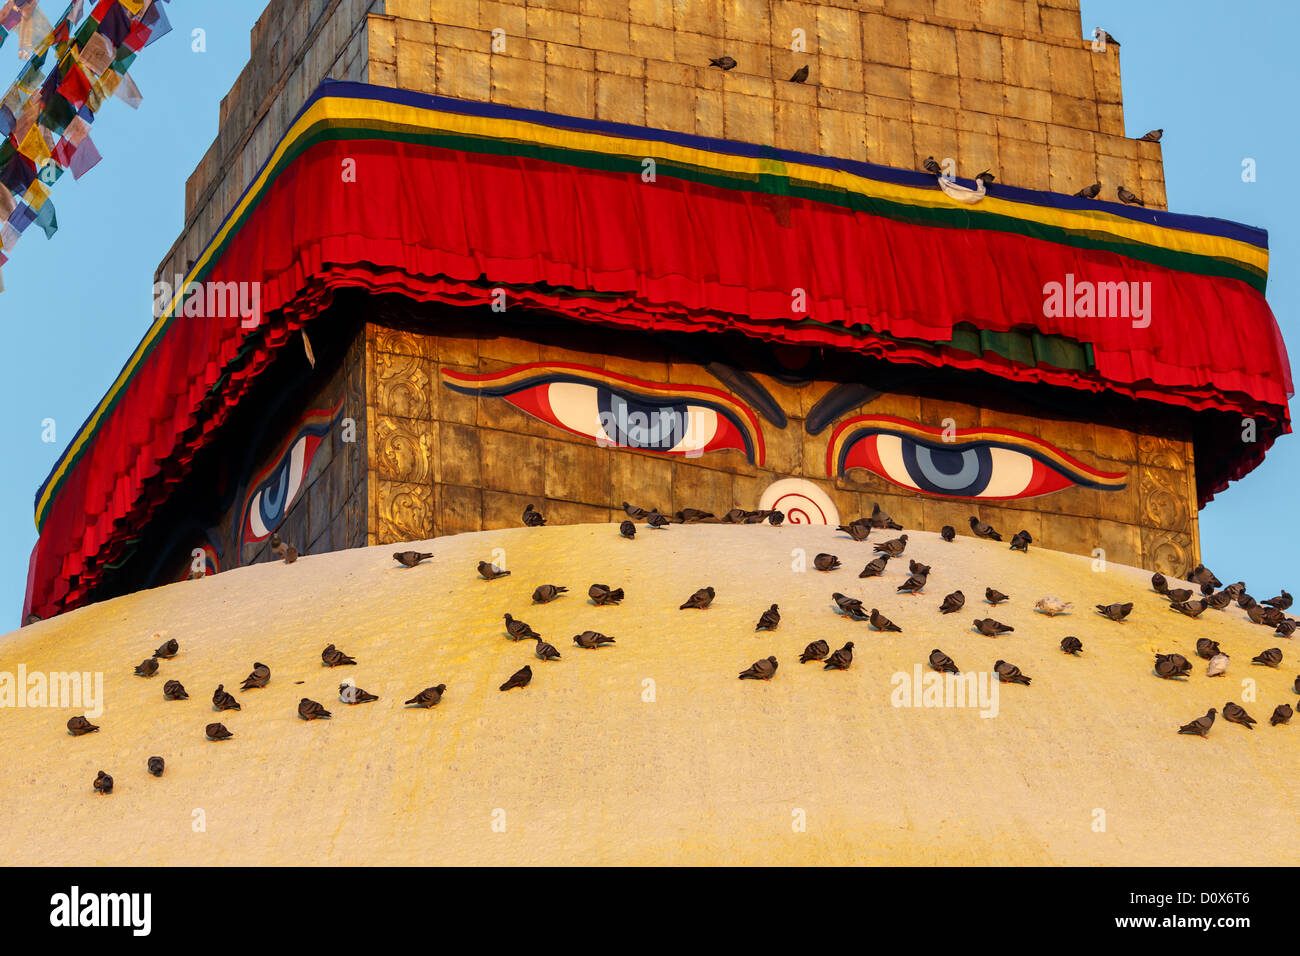 Boudhanath Stupa, Kathmandu, Kathmandu Valley, UNESCO World Heritage Site, Nepal - Stock Image